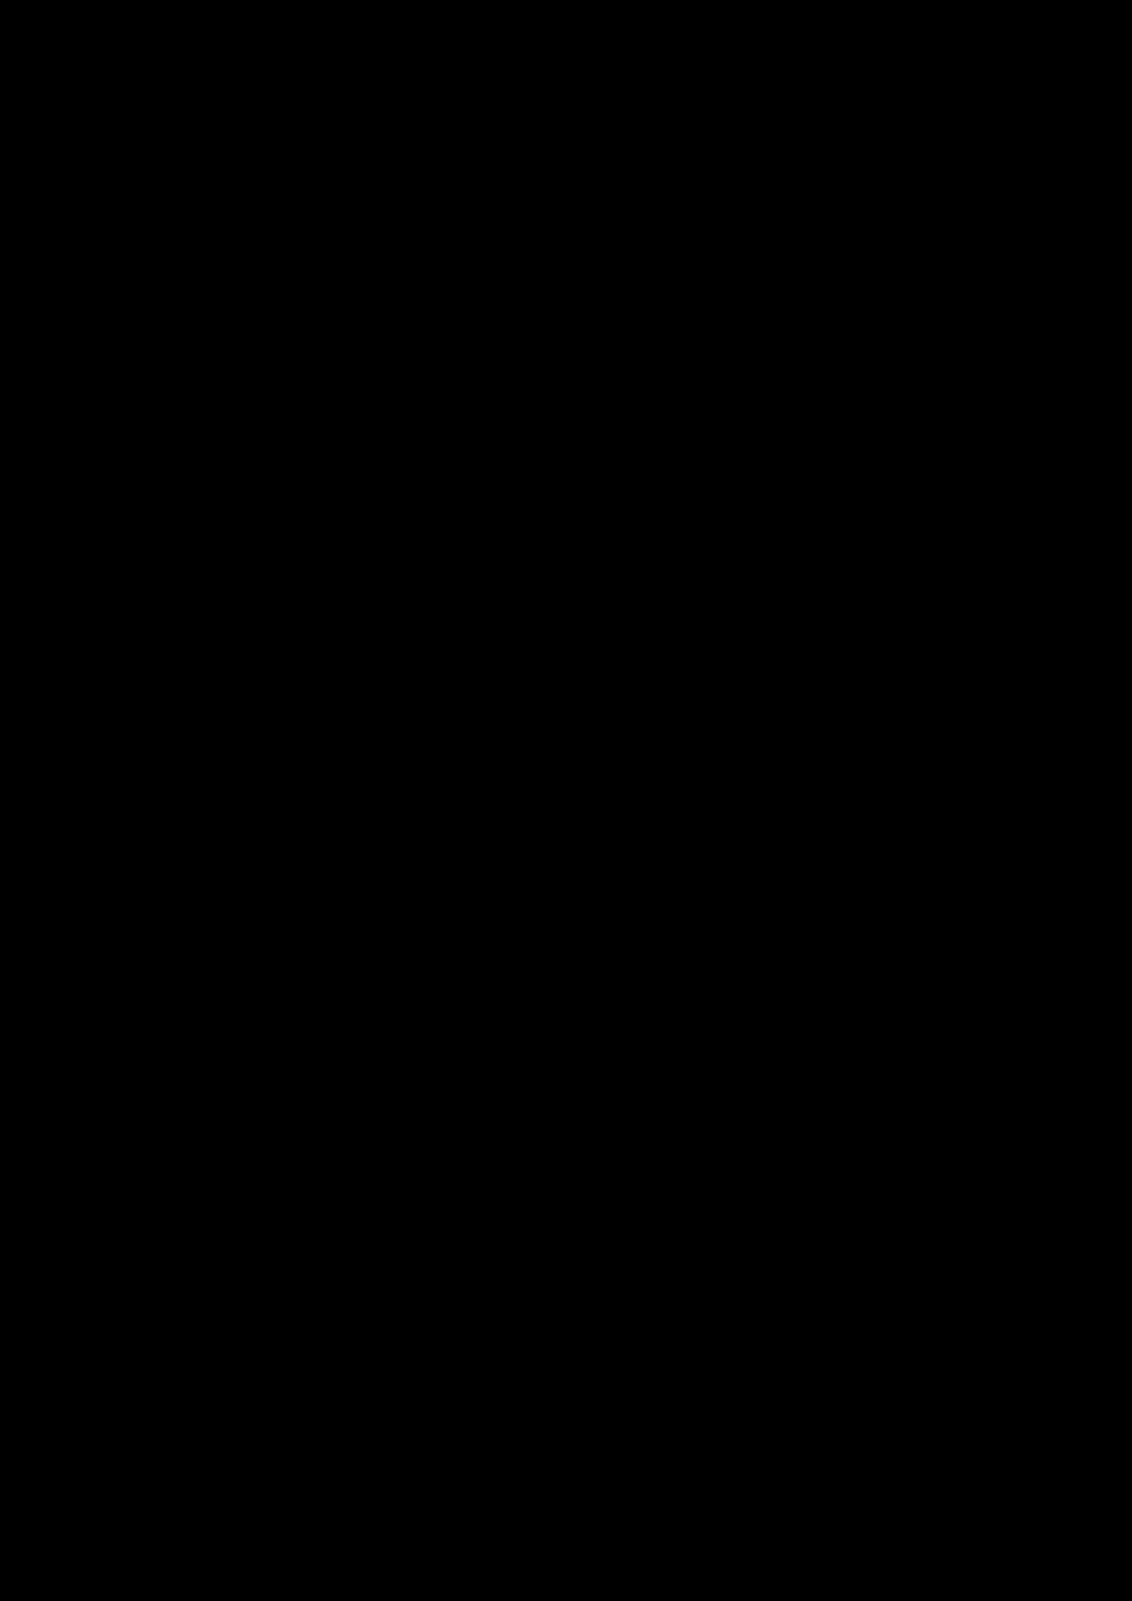 Prosti slide, Image 37